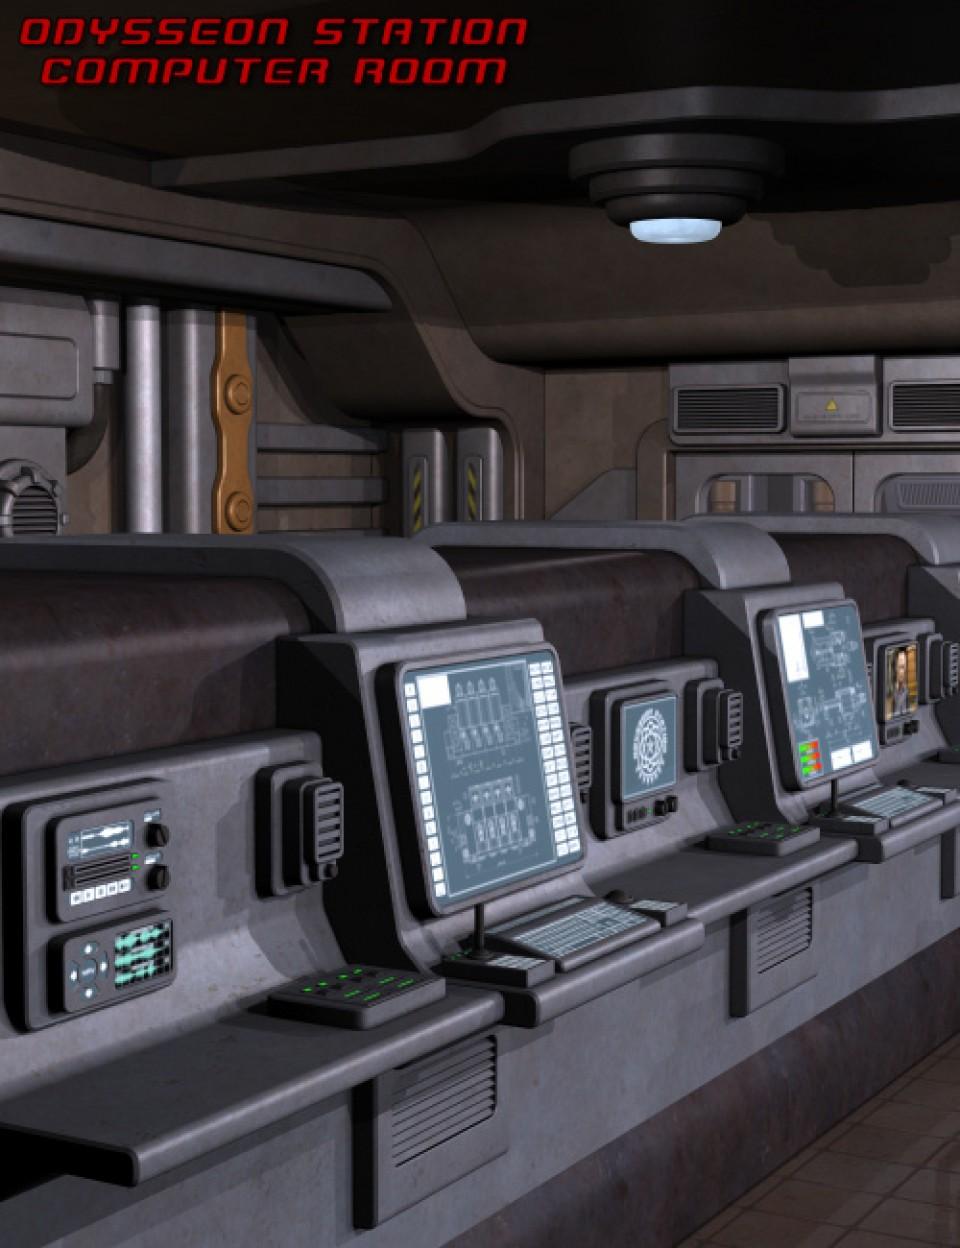 Odysseon Station Computer Room